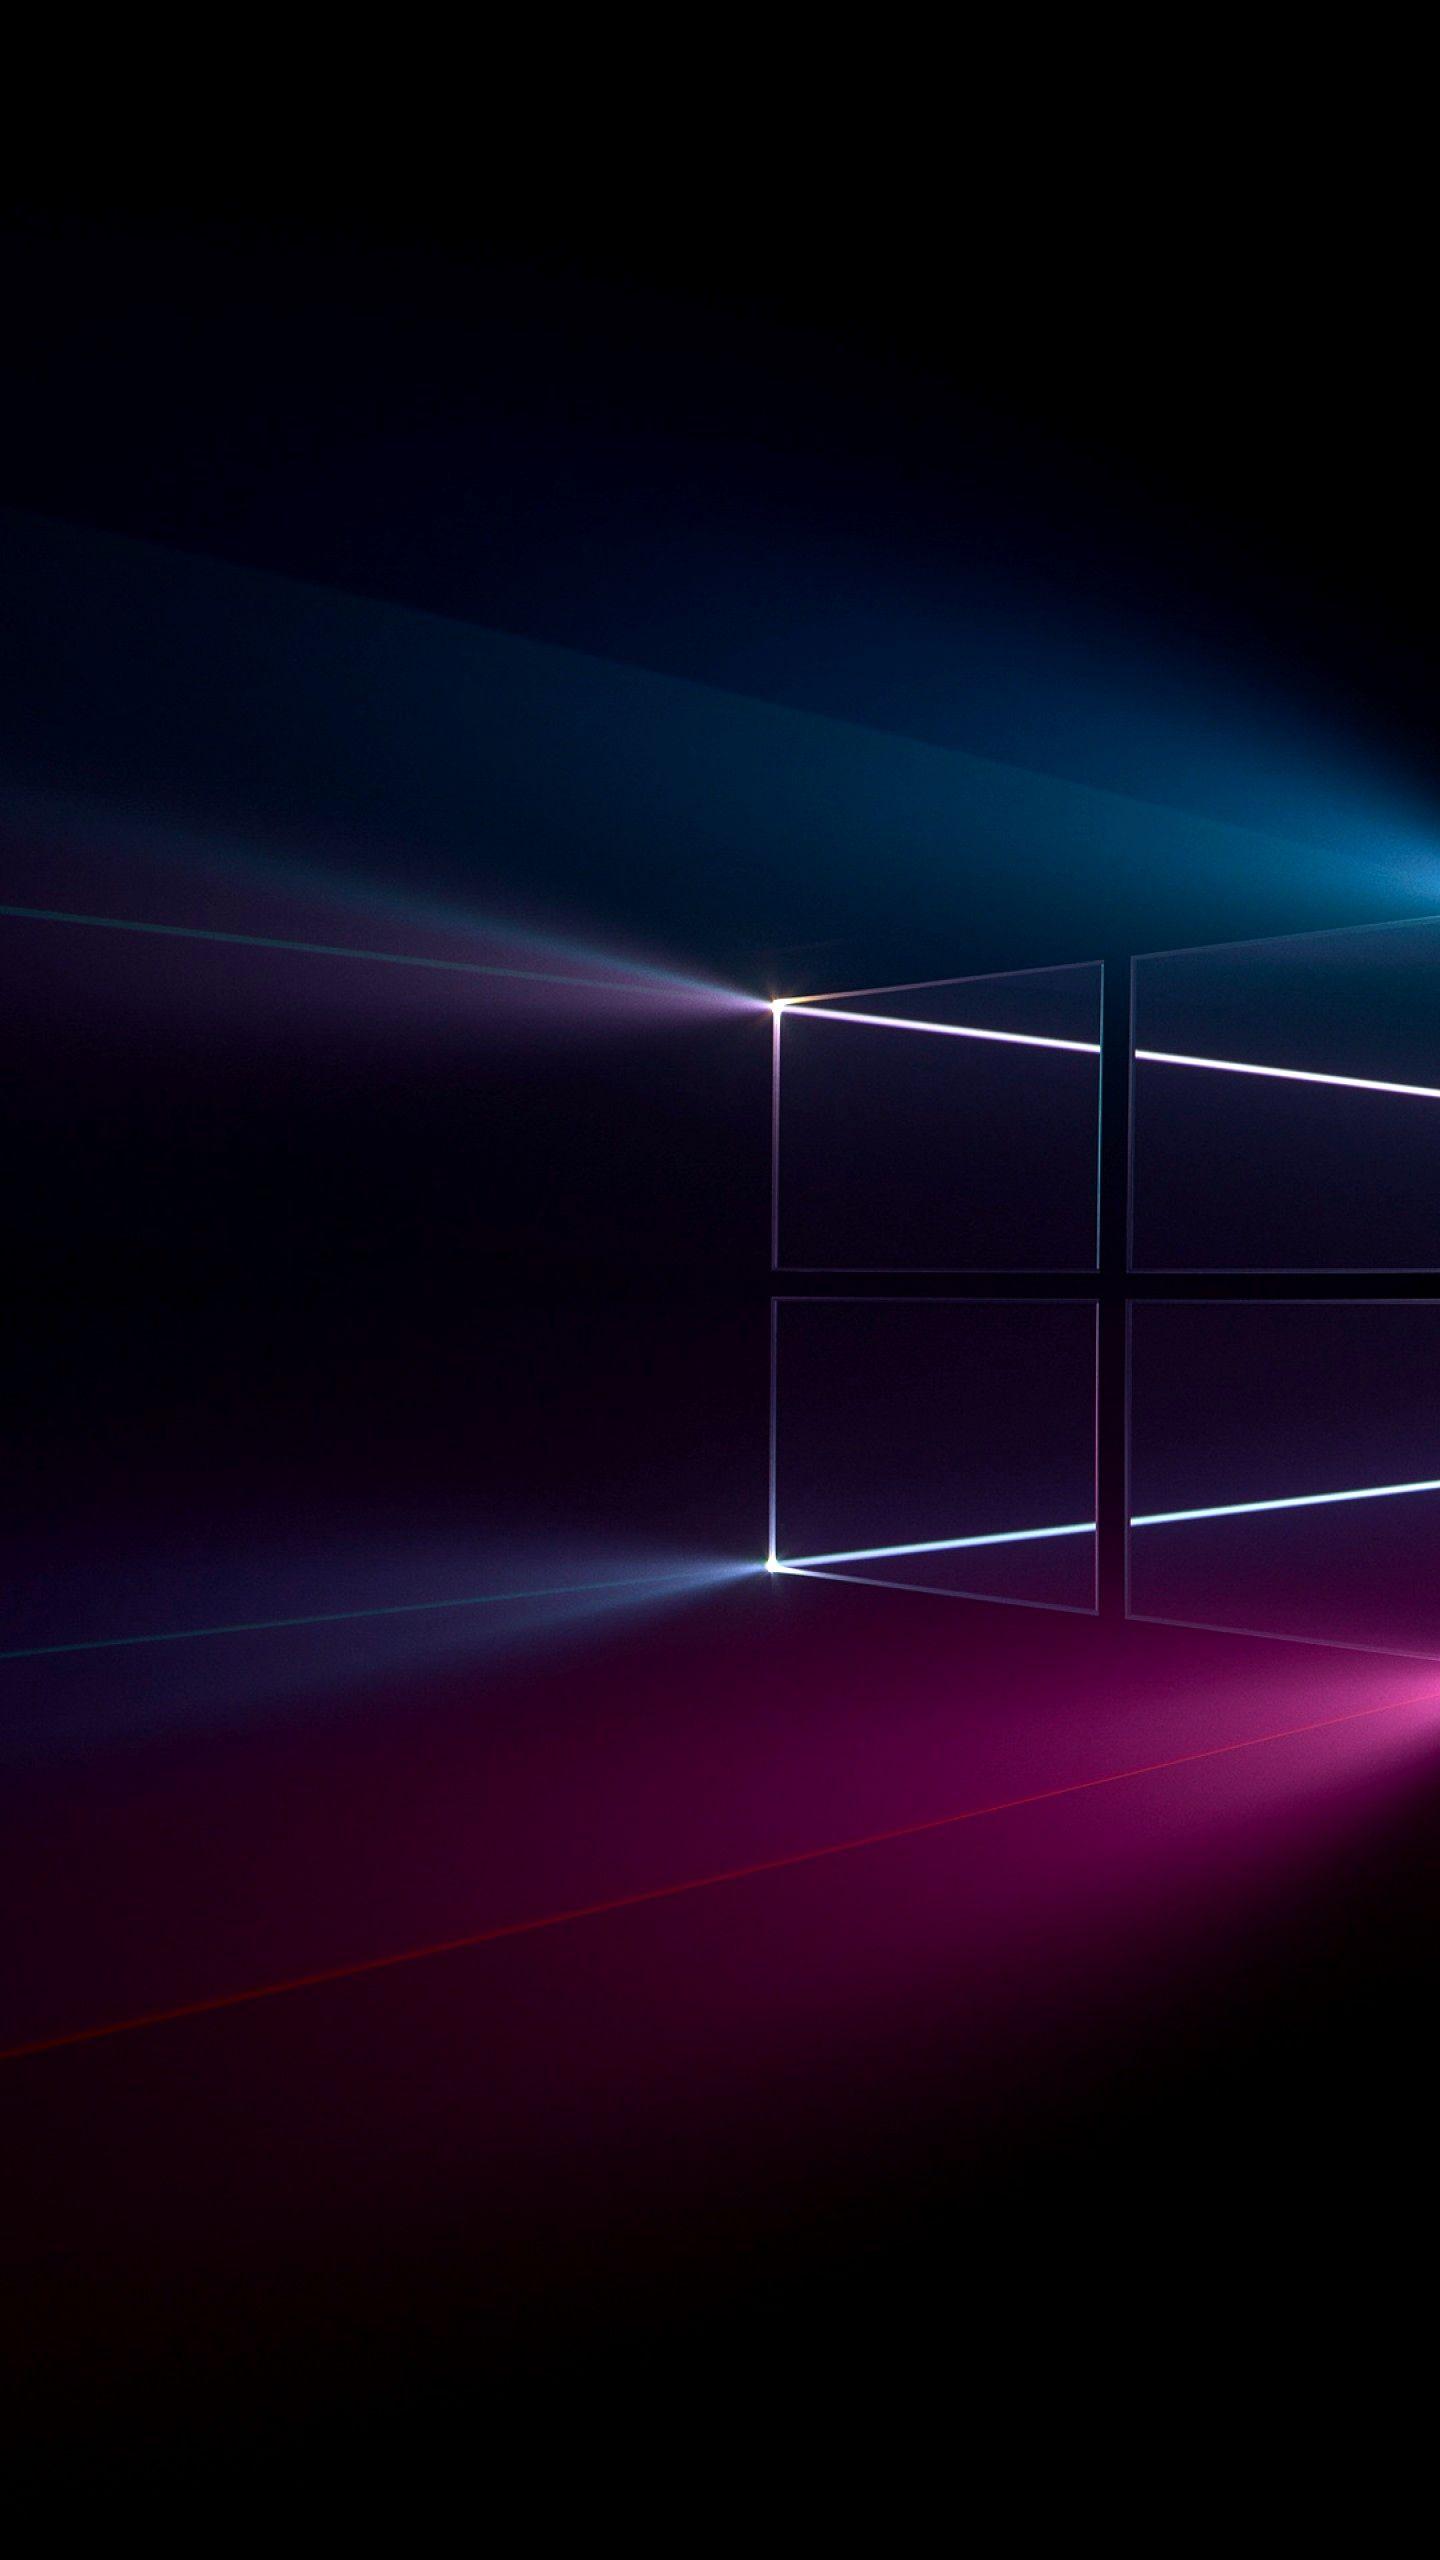 Wallpaper 4k Windows 10 Gallery Windows Wallpaper Wallpaper Windows 10 Dark Wallpaper